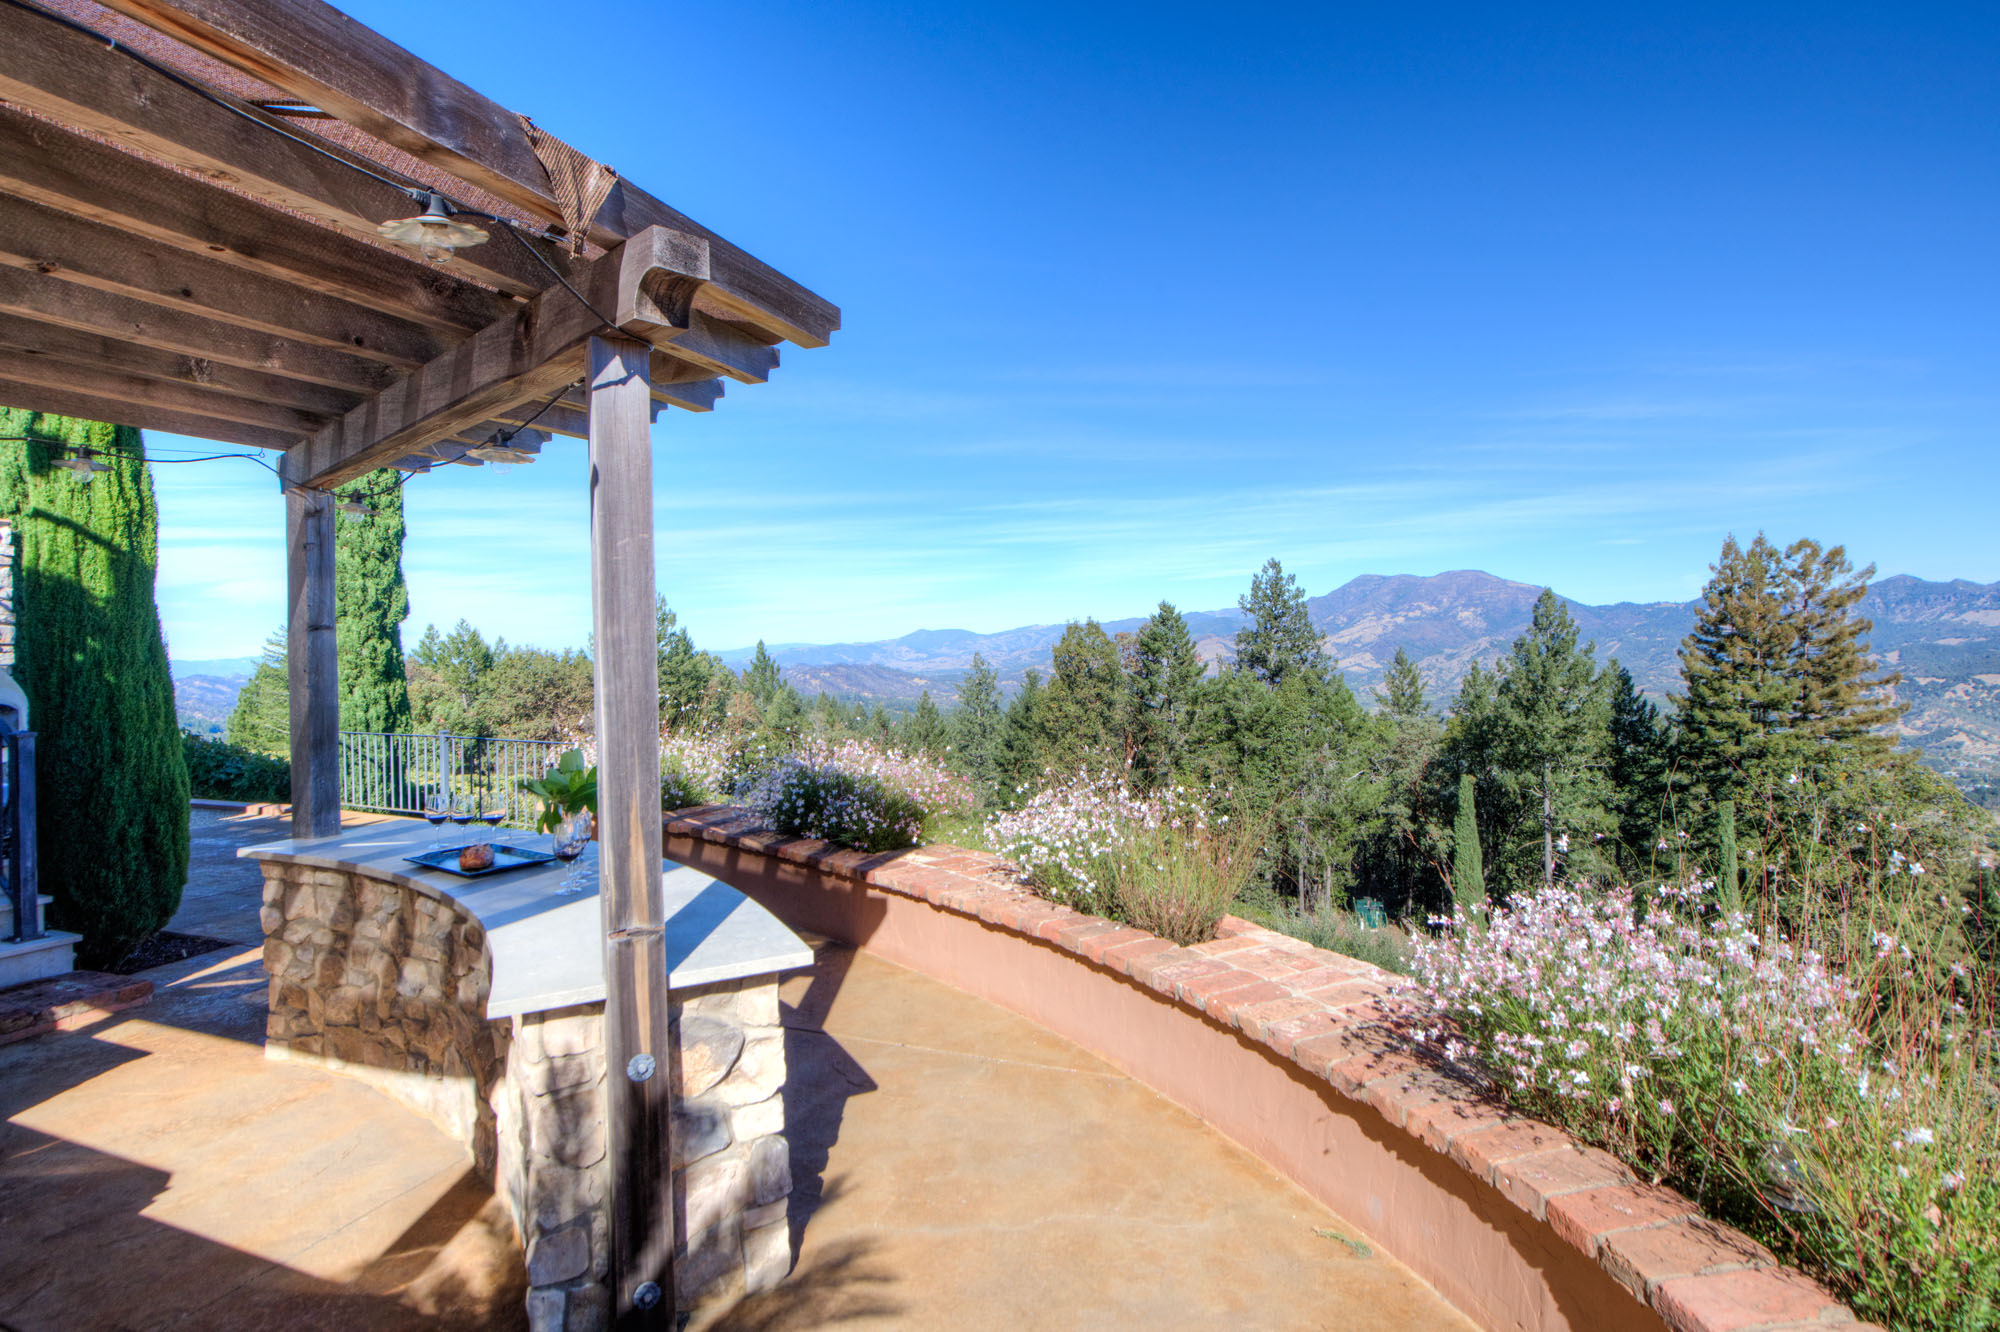 Backyard mountain view